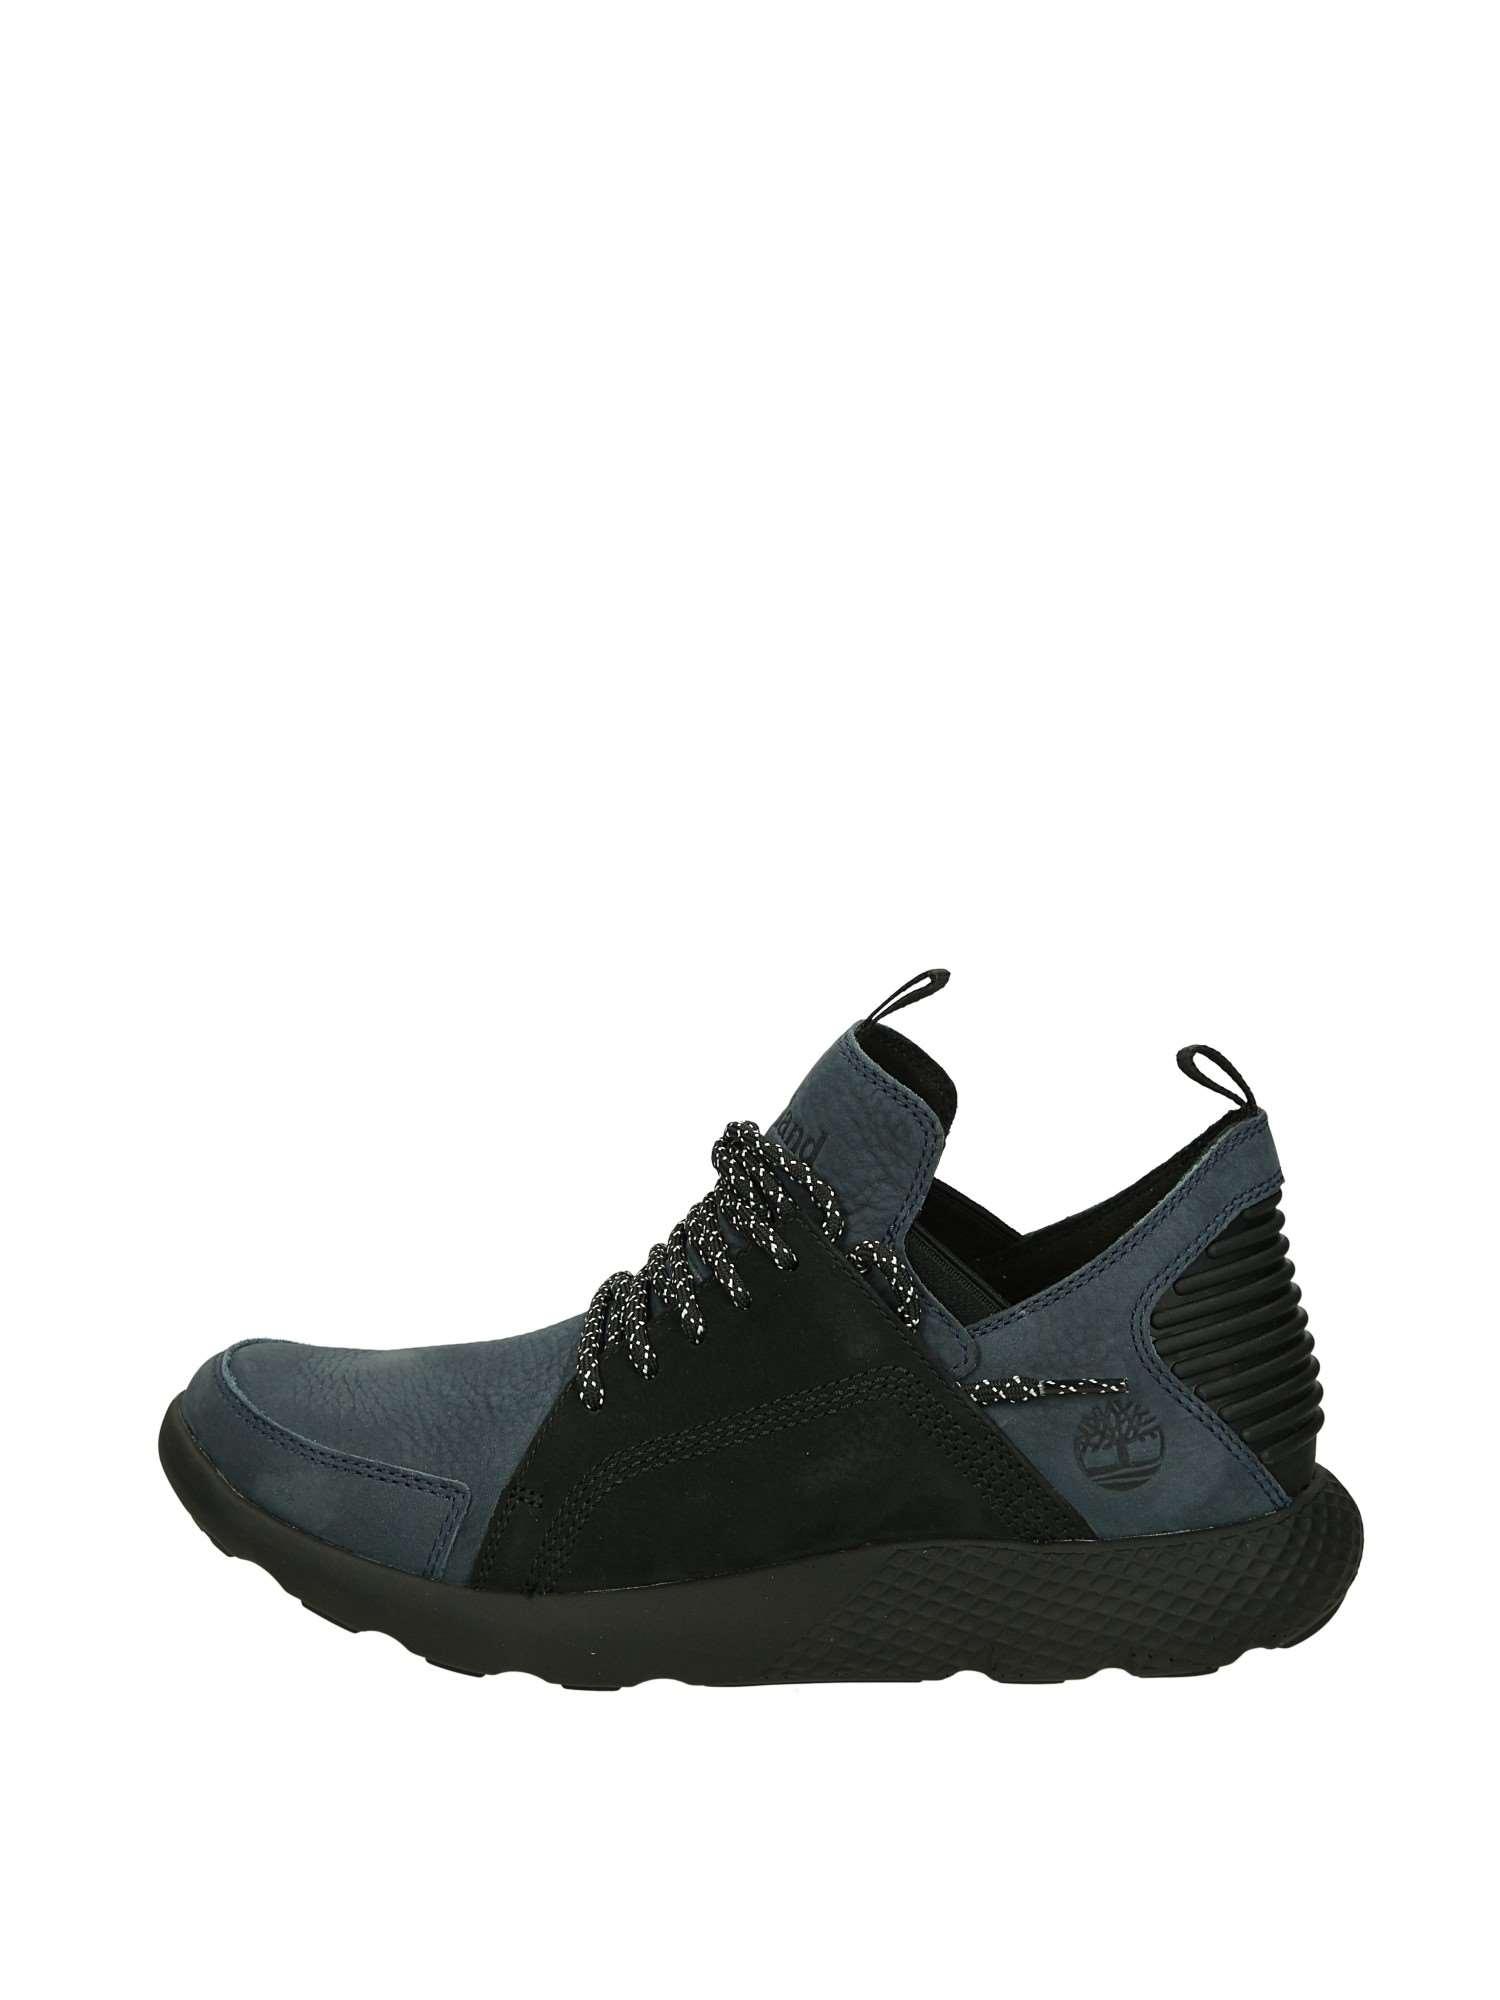 Timberland CA1MG Blu Grigio Scarpe Uomo Sneakers 65fbd5370d1